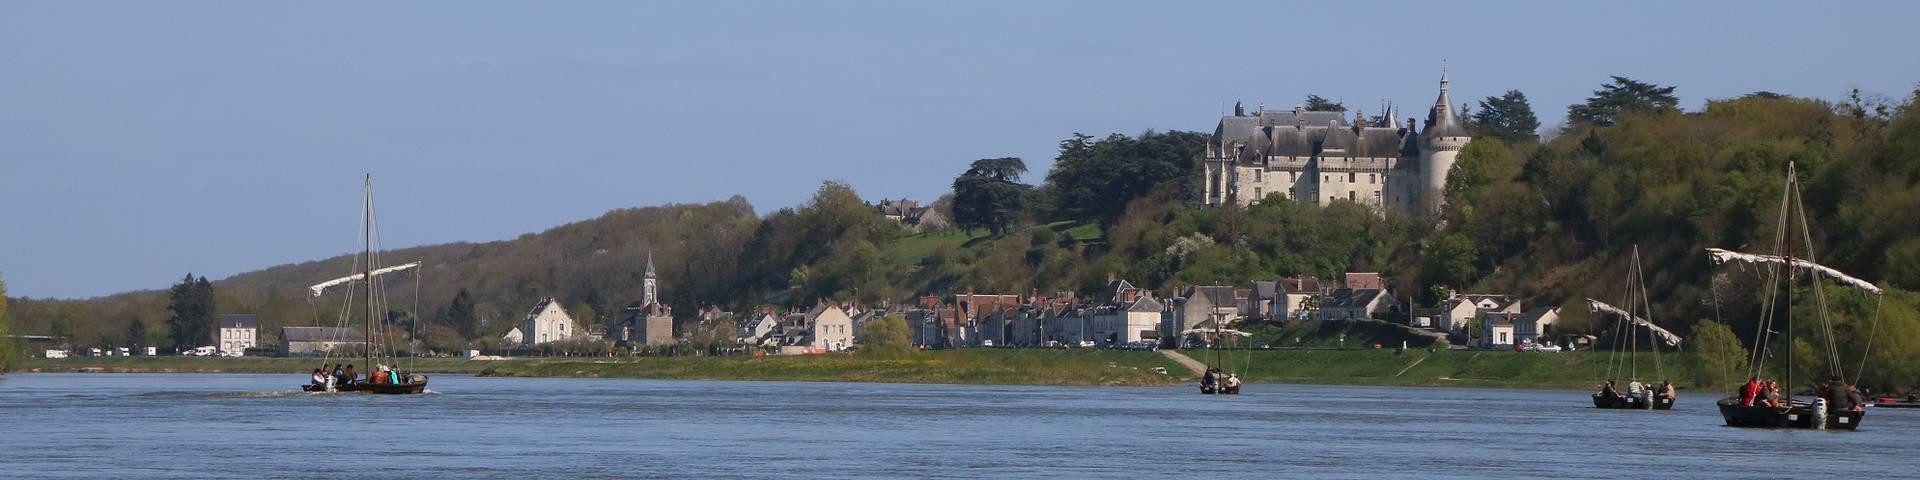 Las orillas del Loira en Chaumont. © OTBC